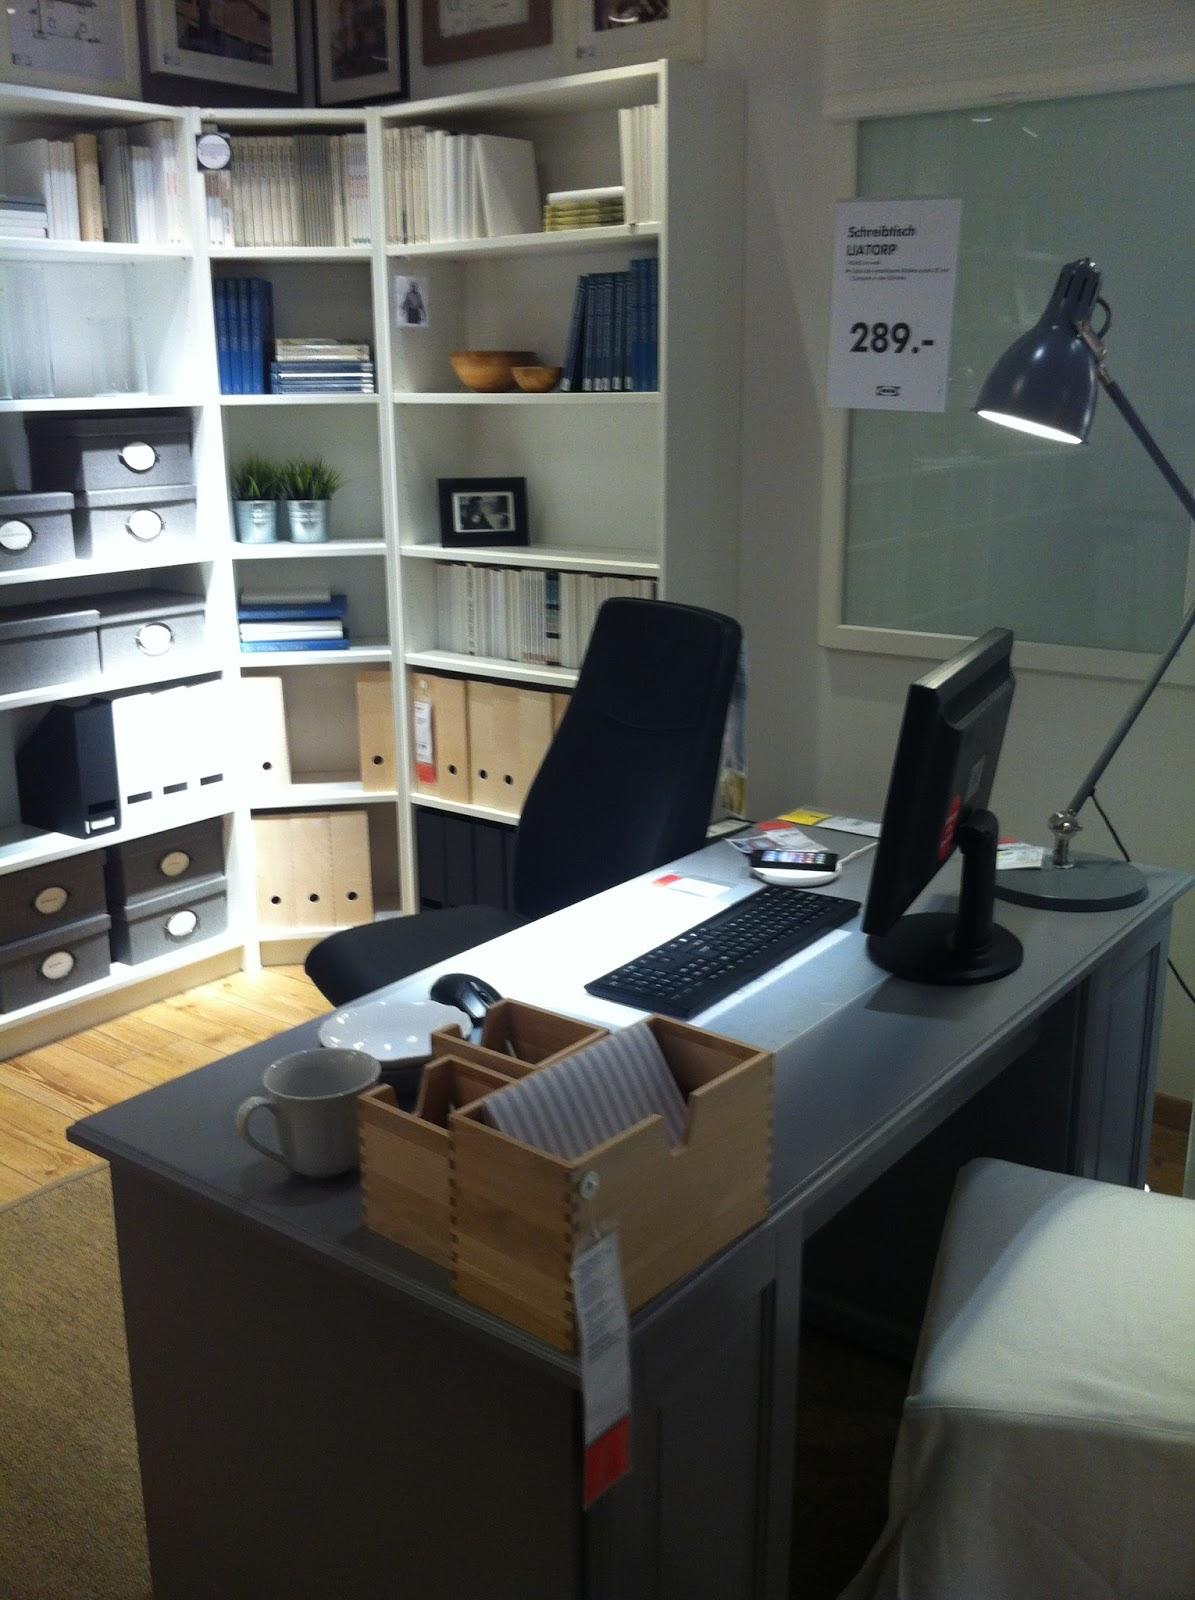 ikea kiel telefon siller landschaftsarchitekten kiel ikea. Black Bedroom Furniture Sets. Home Design Ideas